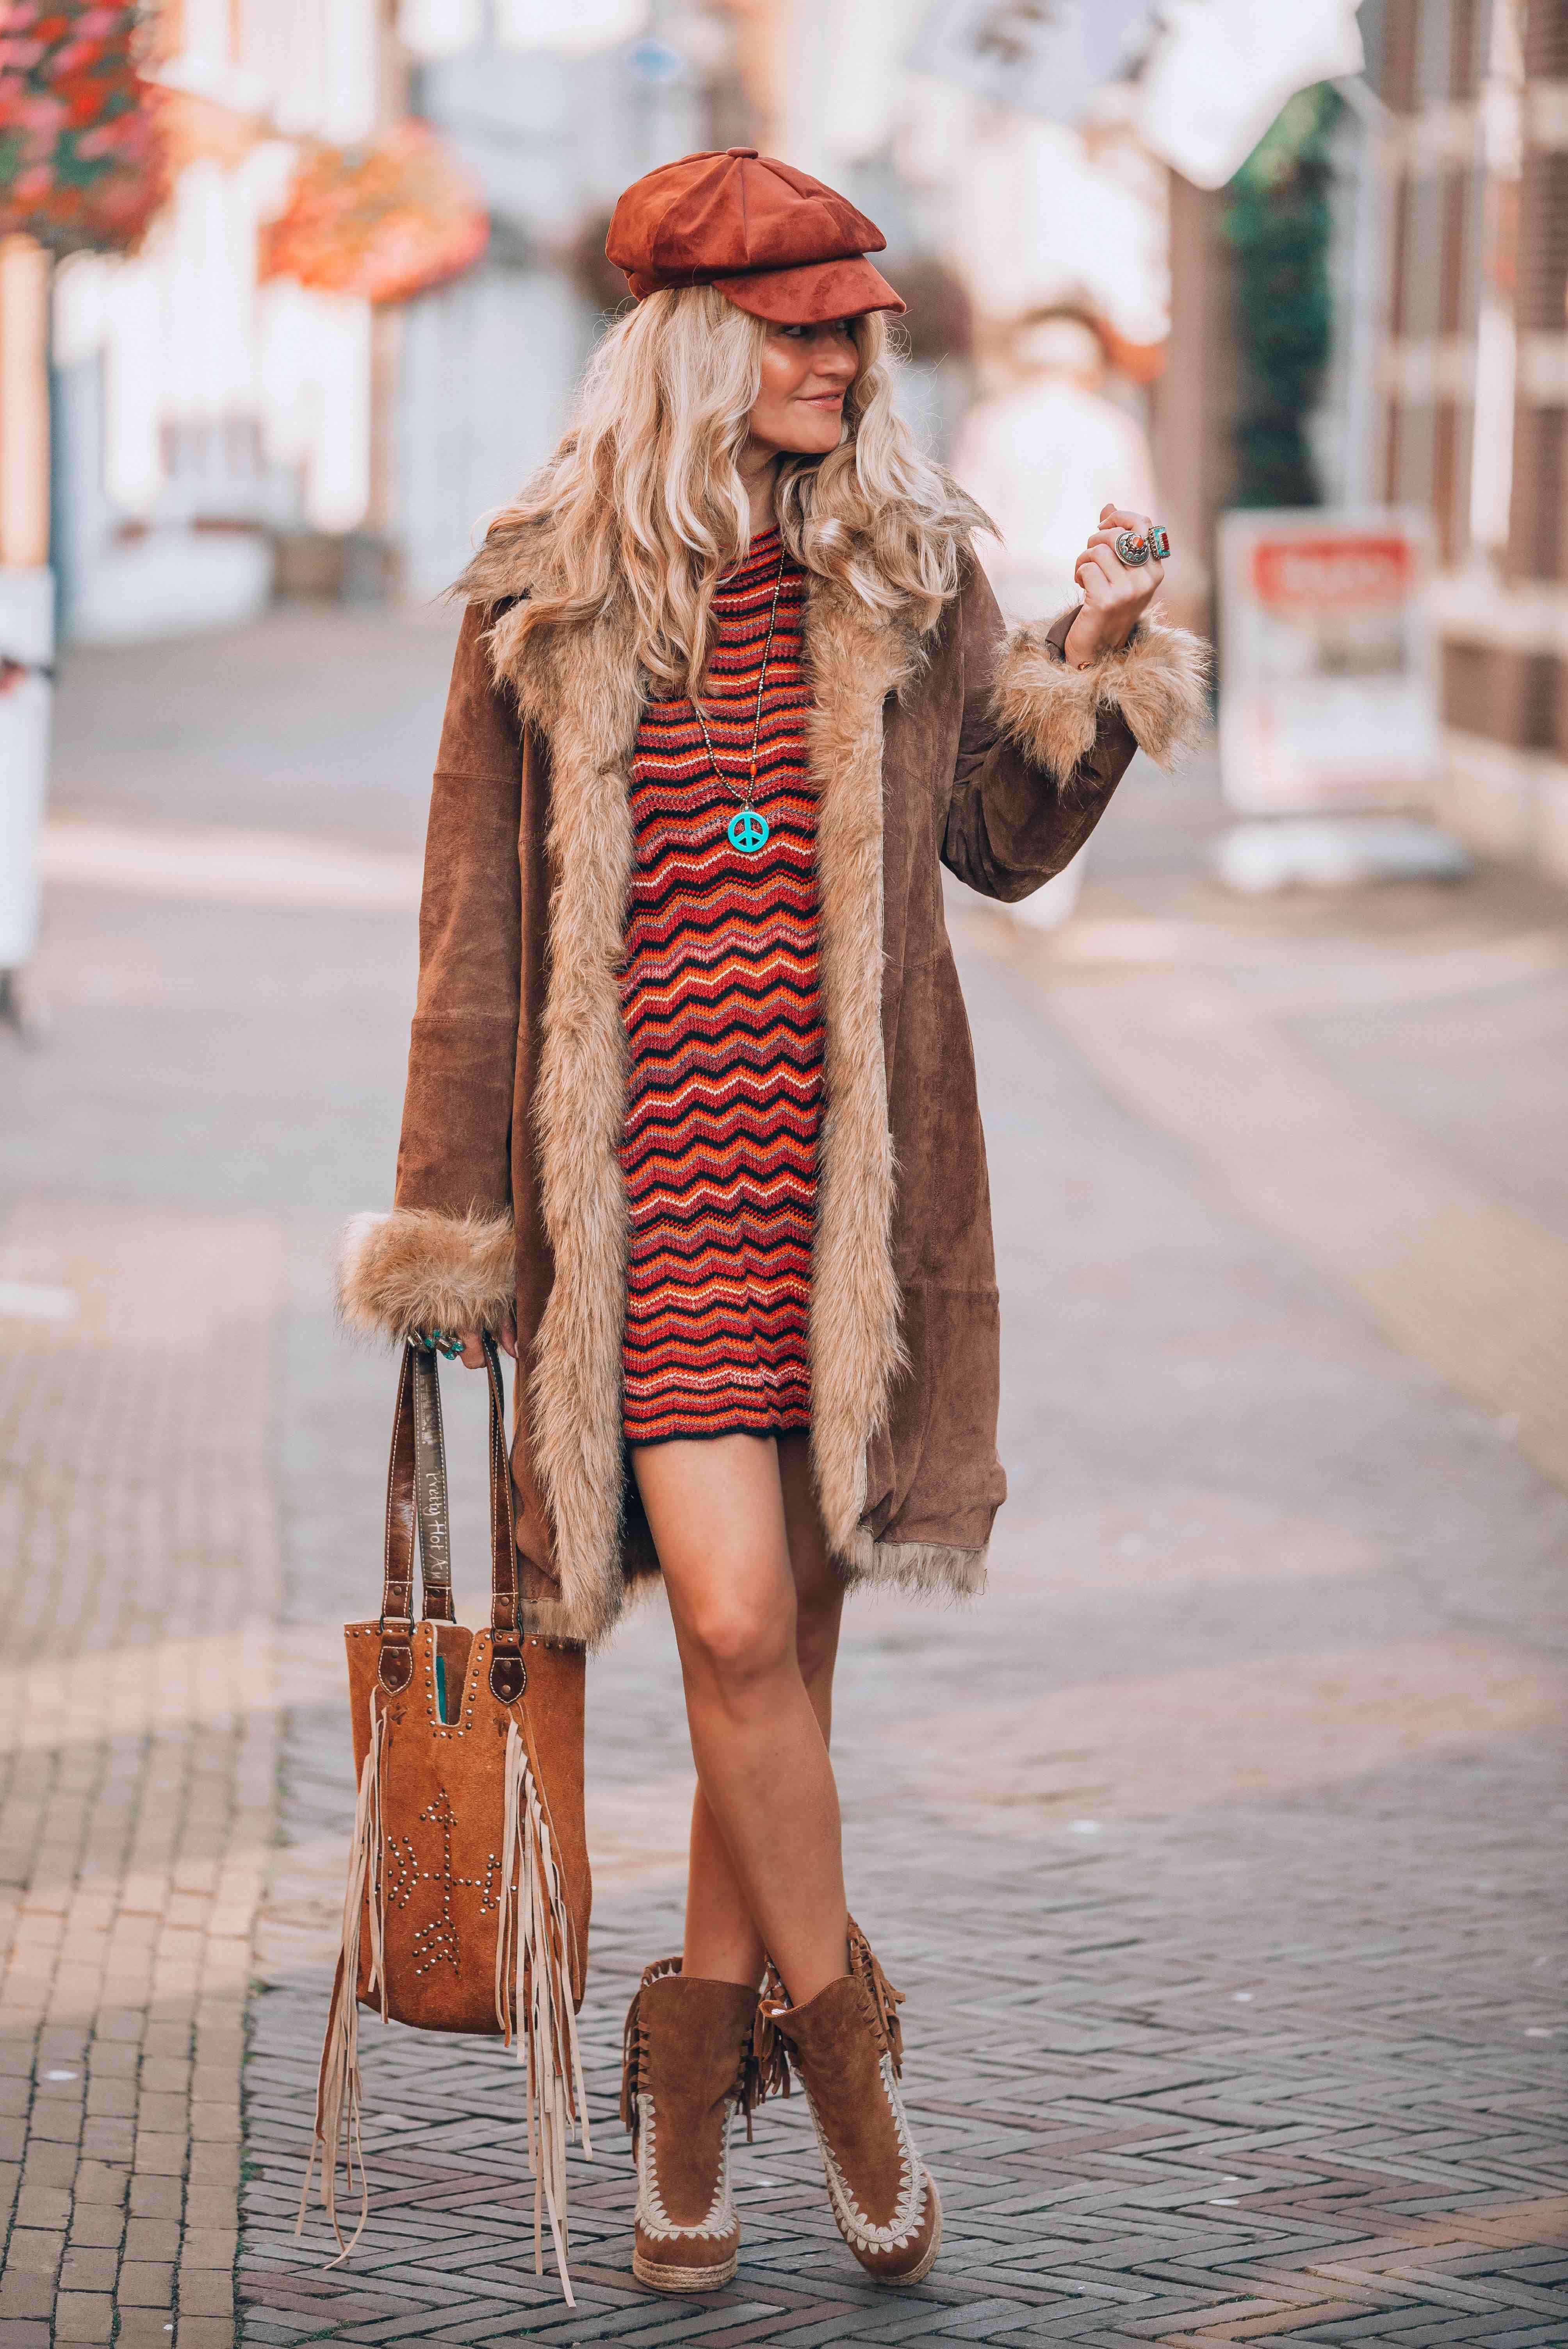 Boho Chic Boho Winter Outfits Boho Fashion Hippie Boho Chic Fashion